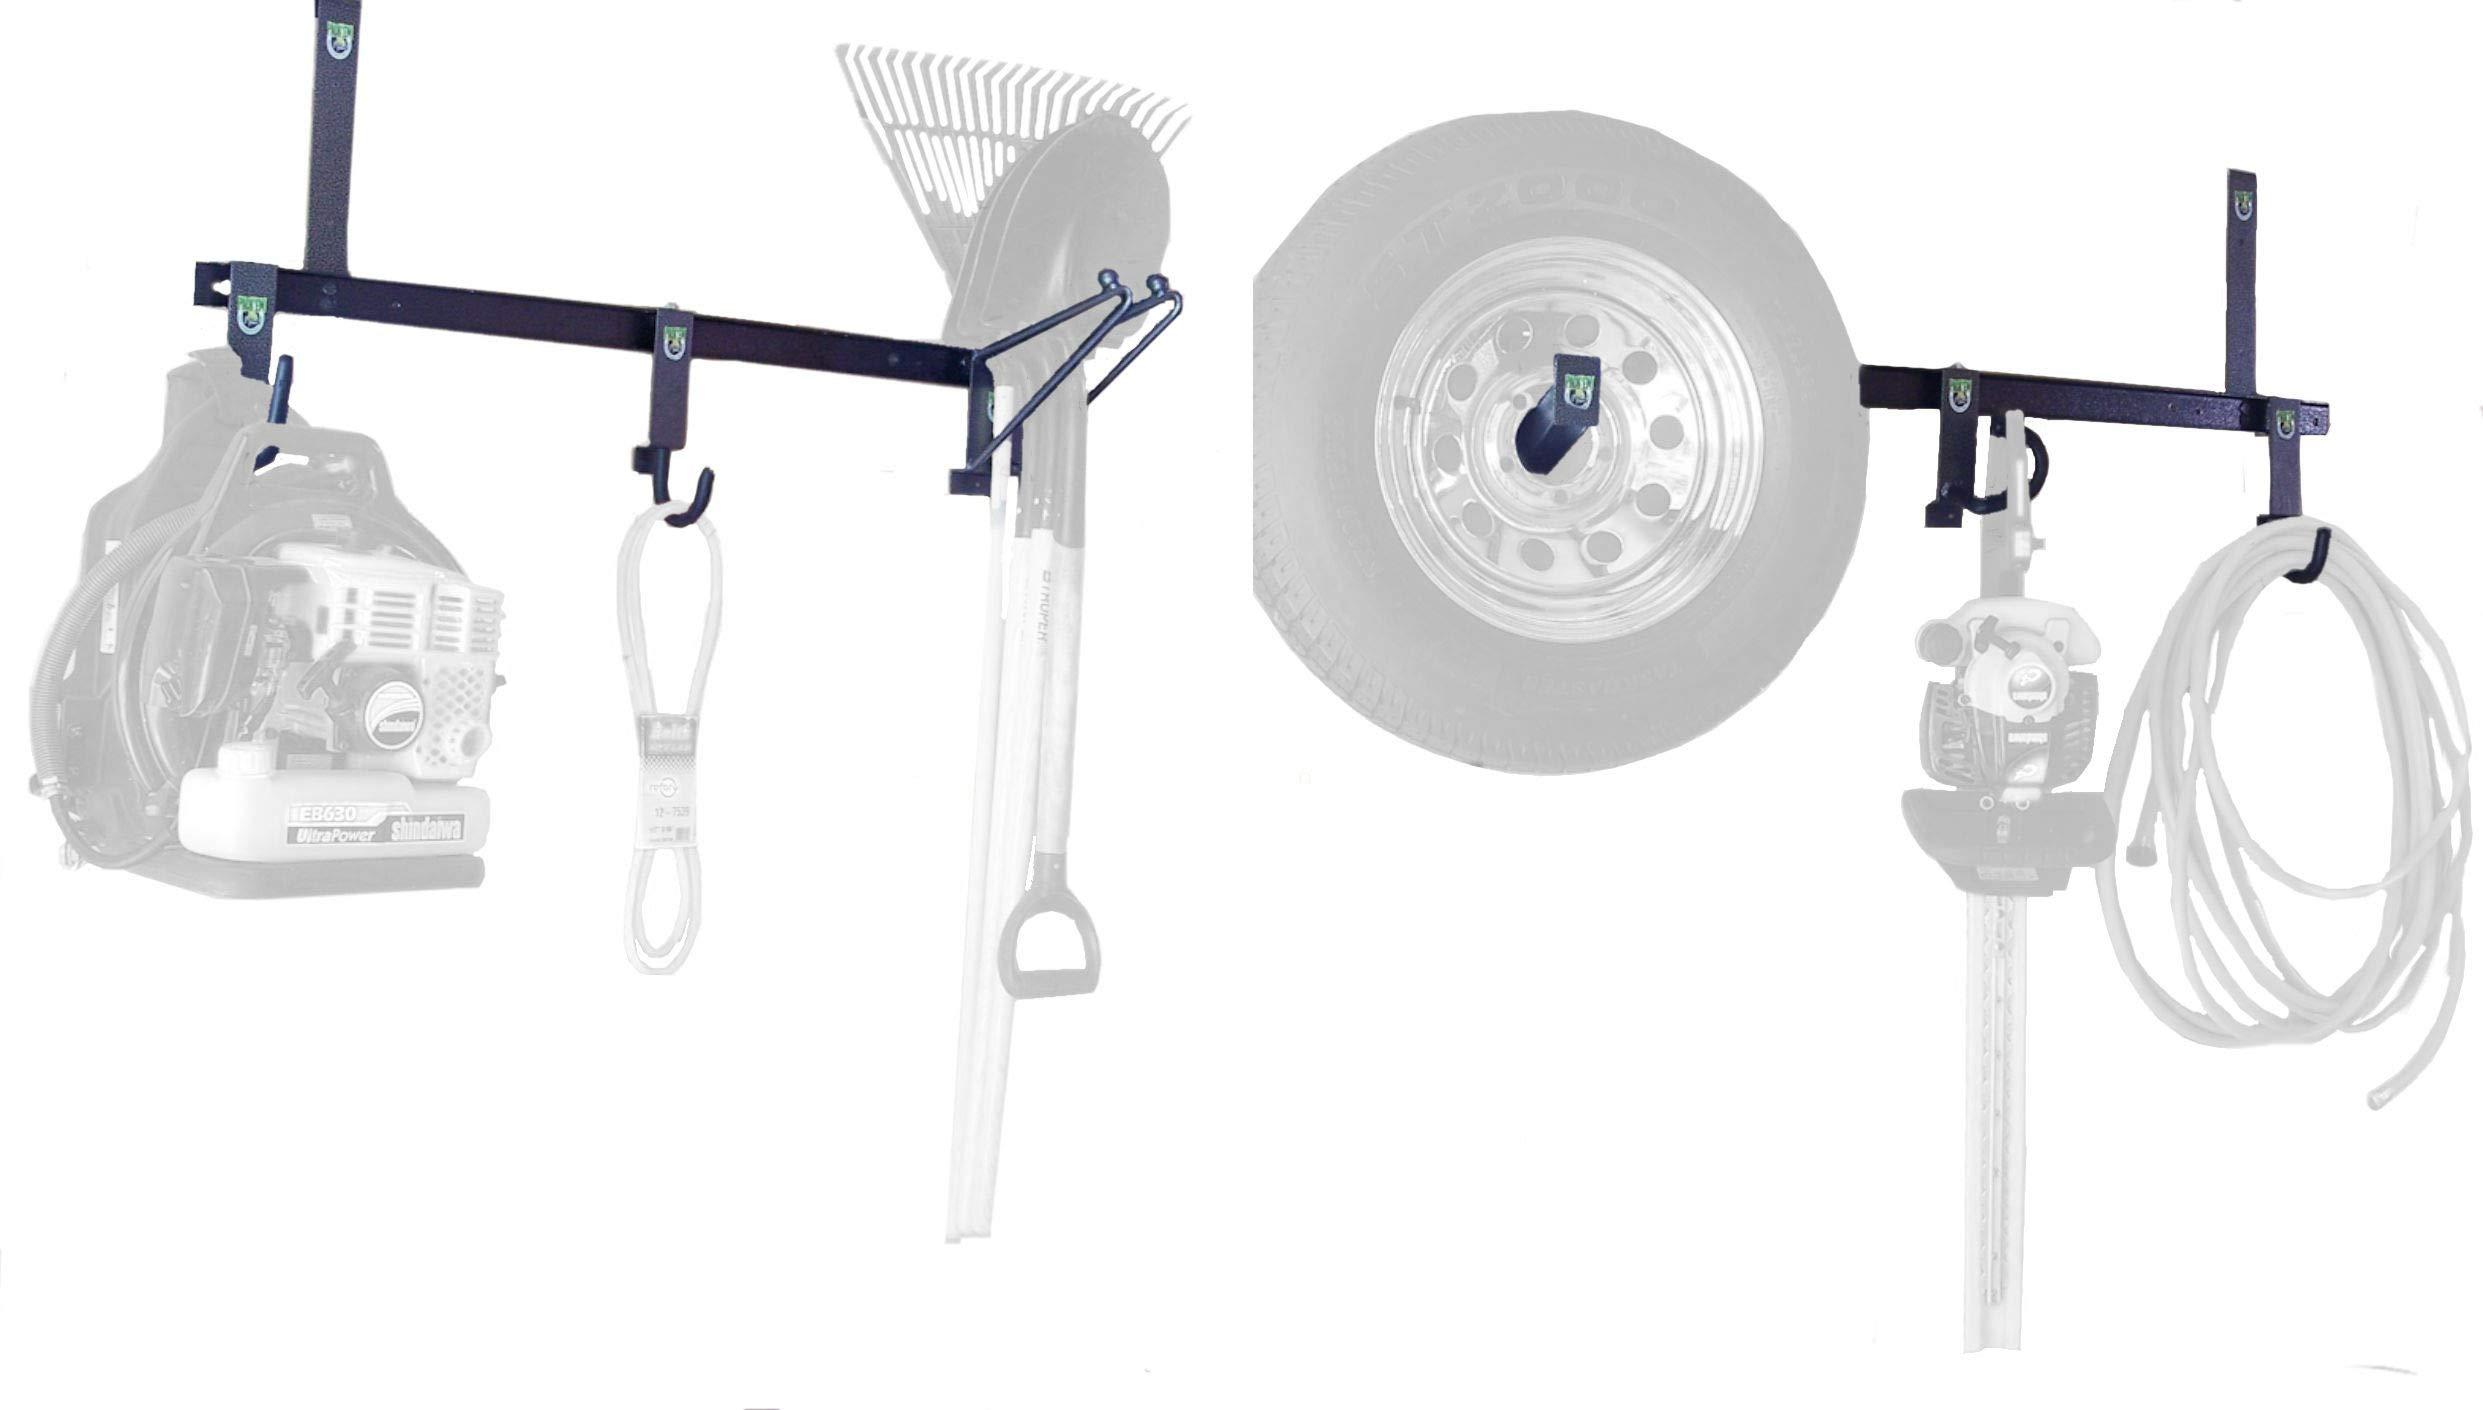 Enclosed Trailer Tool Storage Rack System (PK-OP2 - PK-BM) by Pack'em Racks by Pack'em